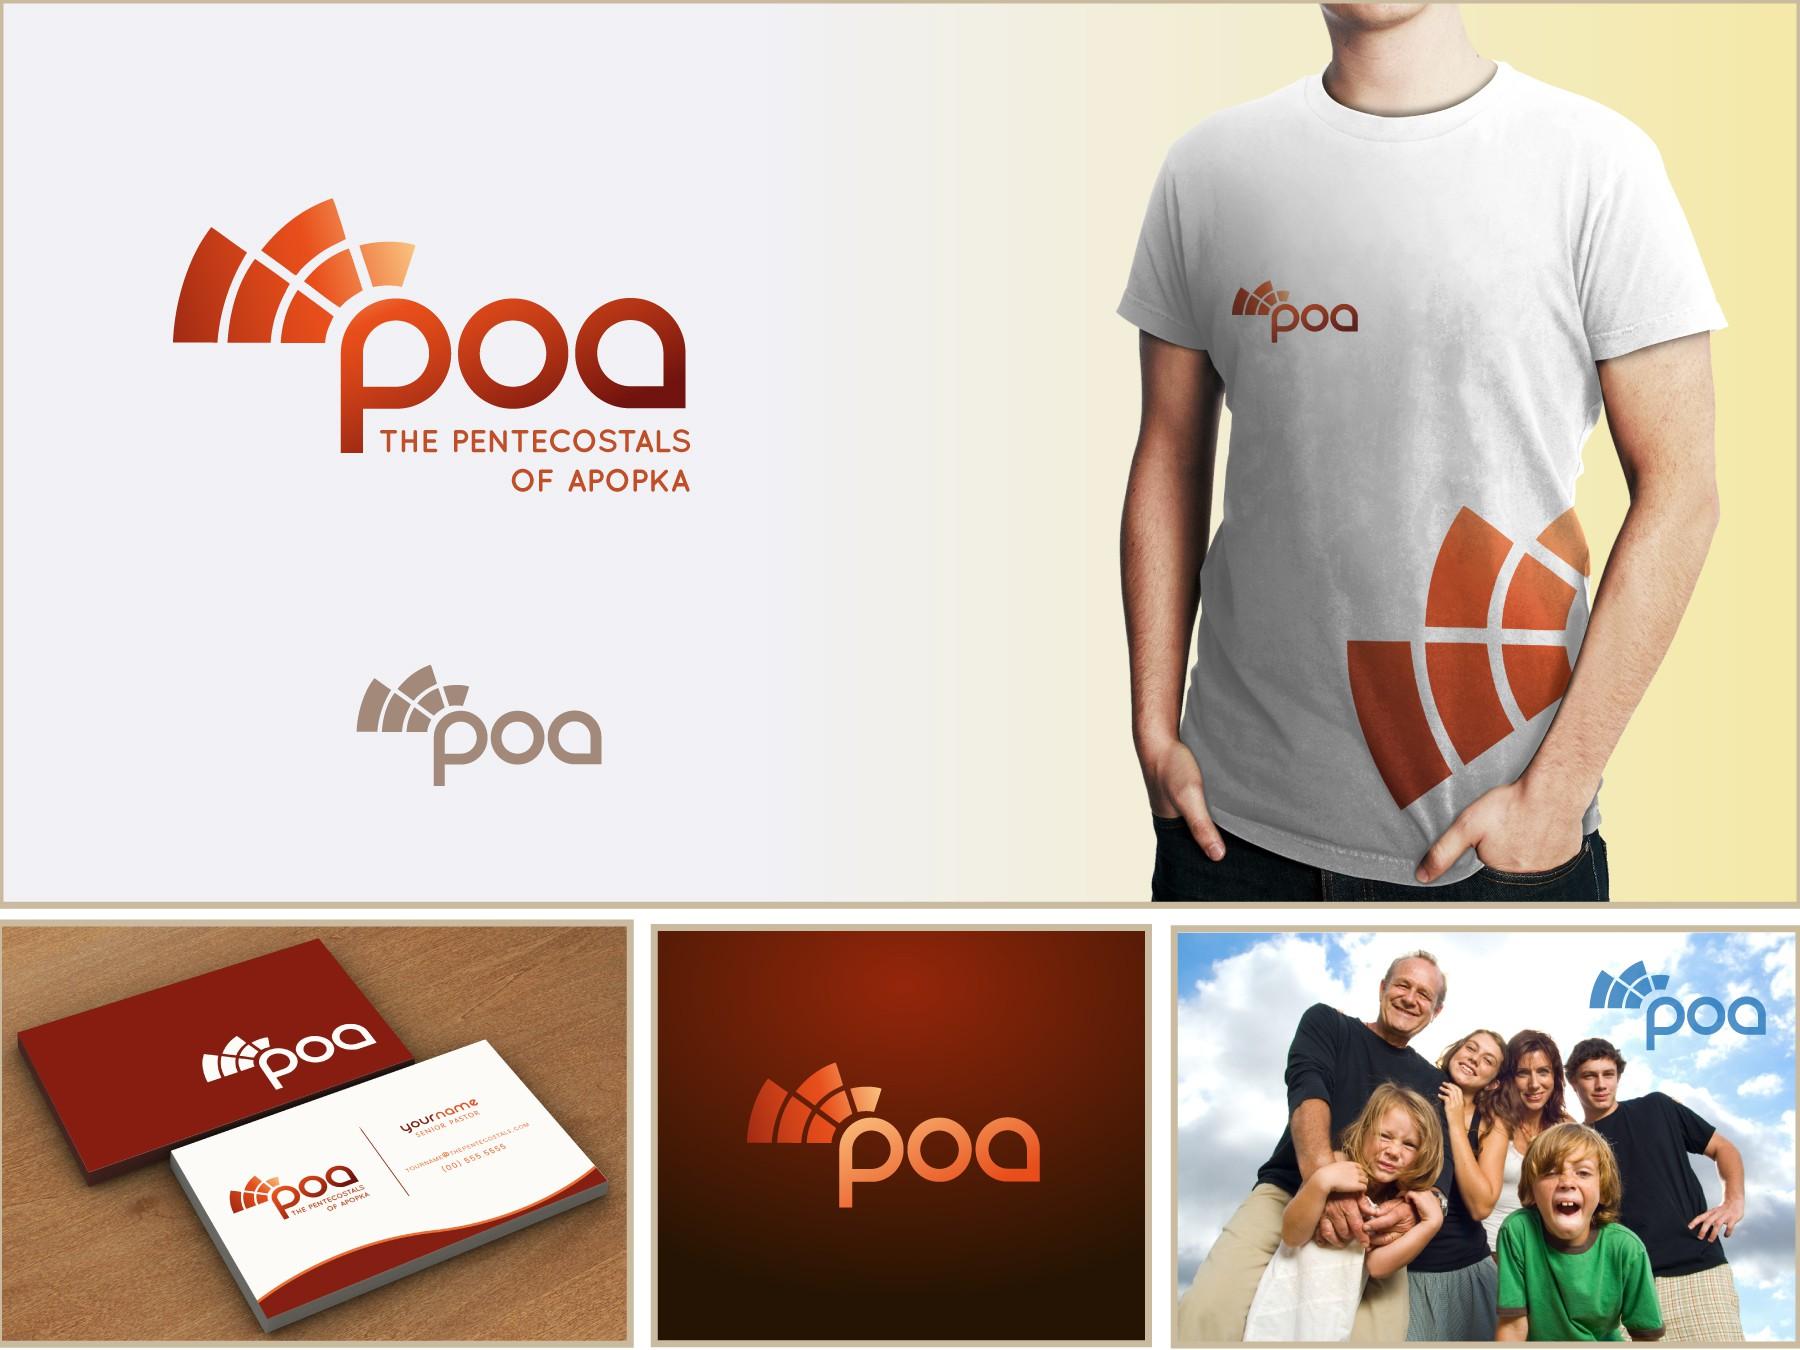 logo for The Pentecostals of Apopka